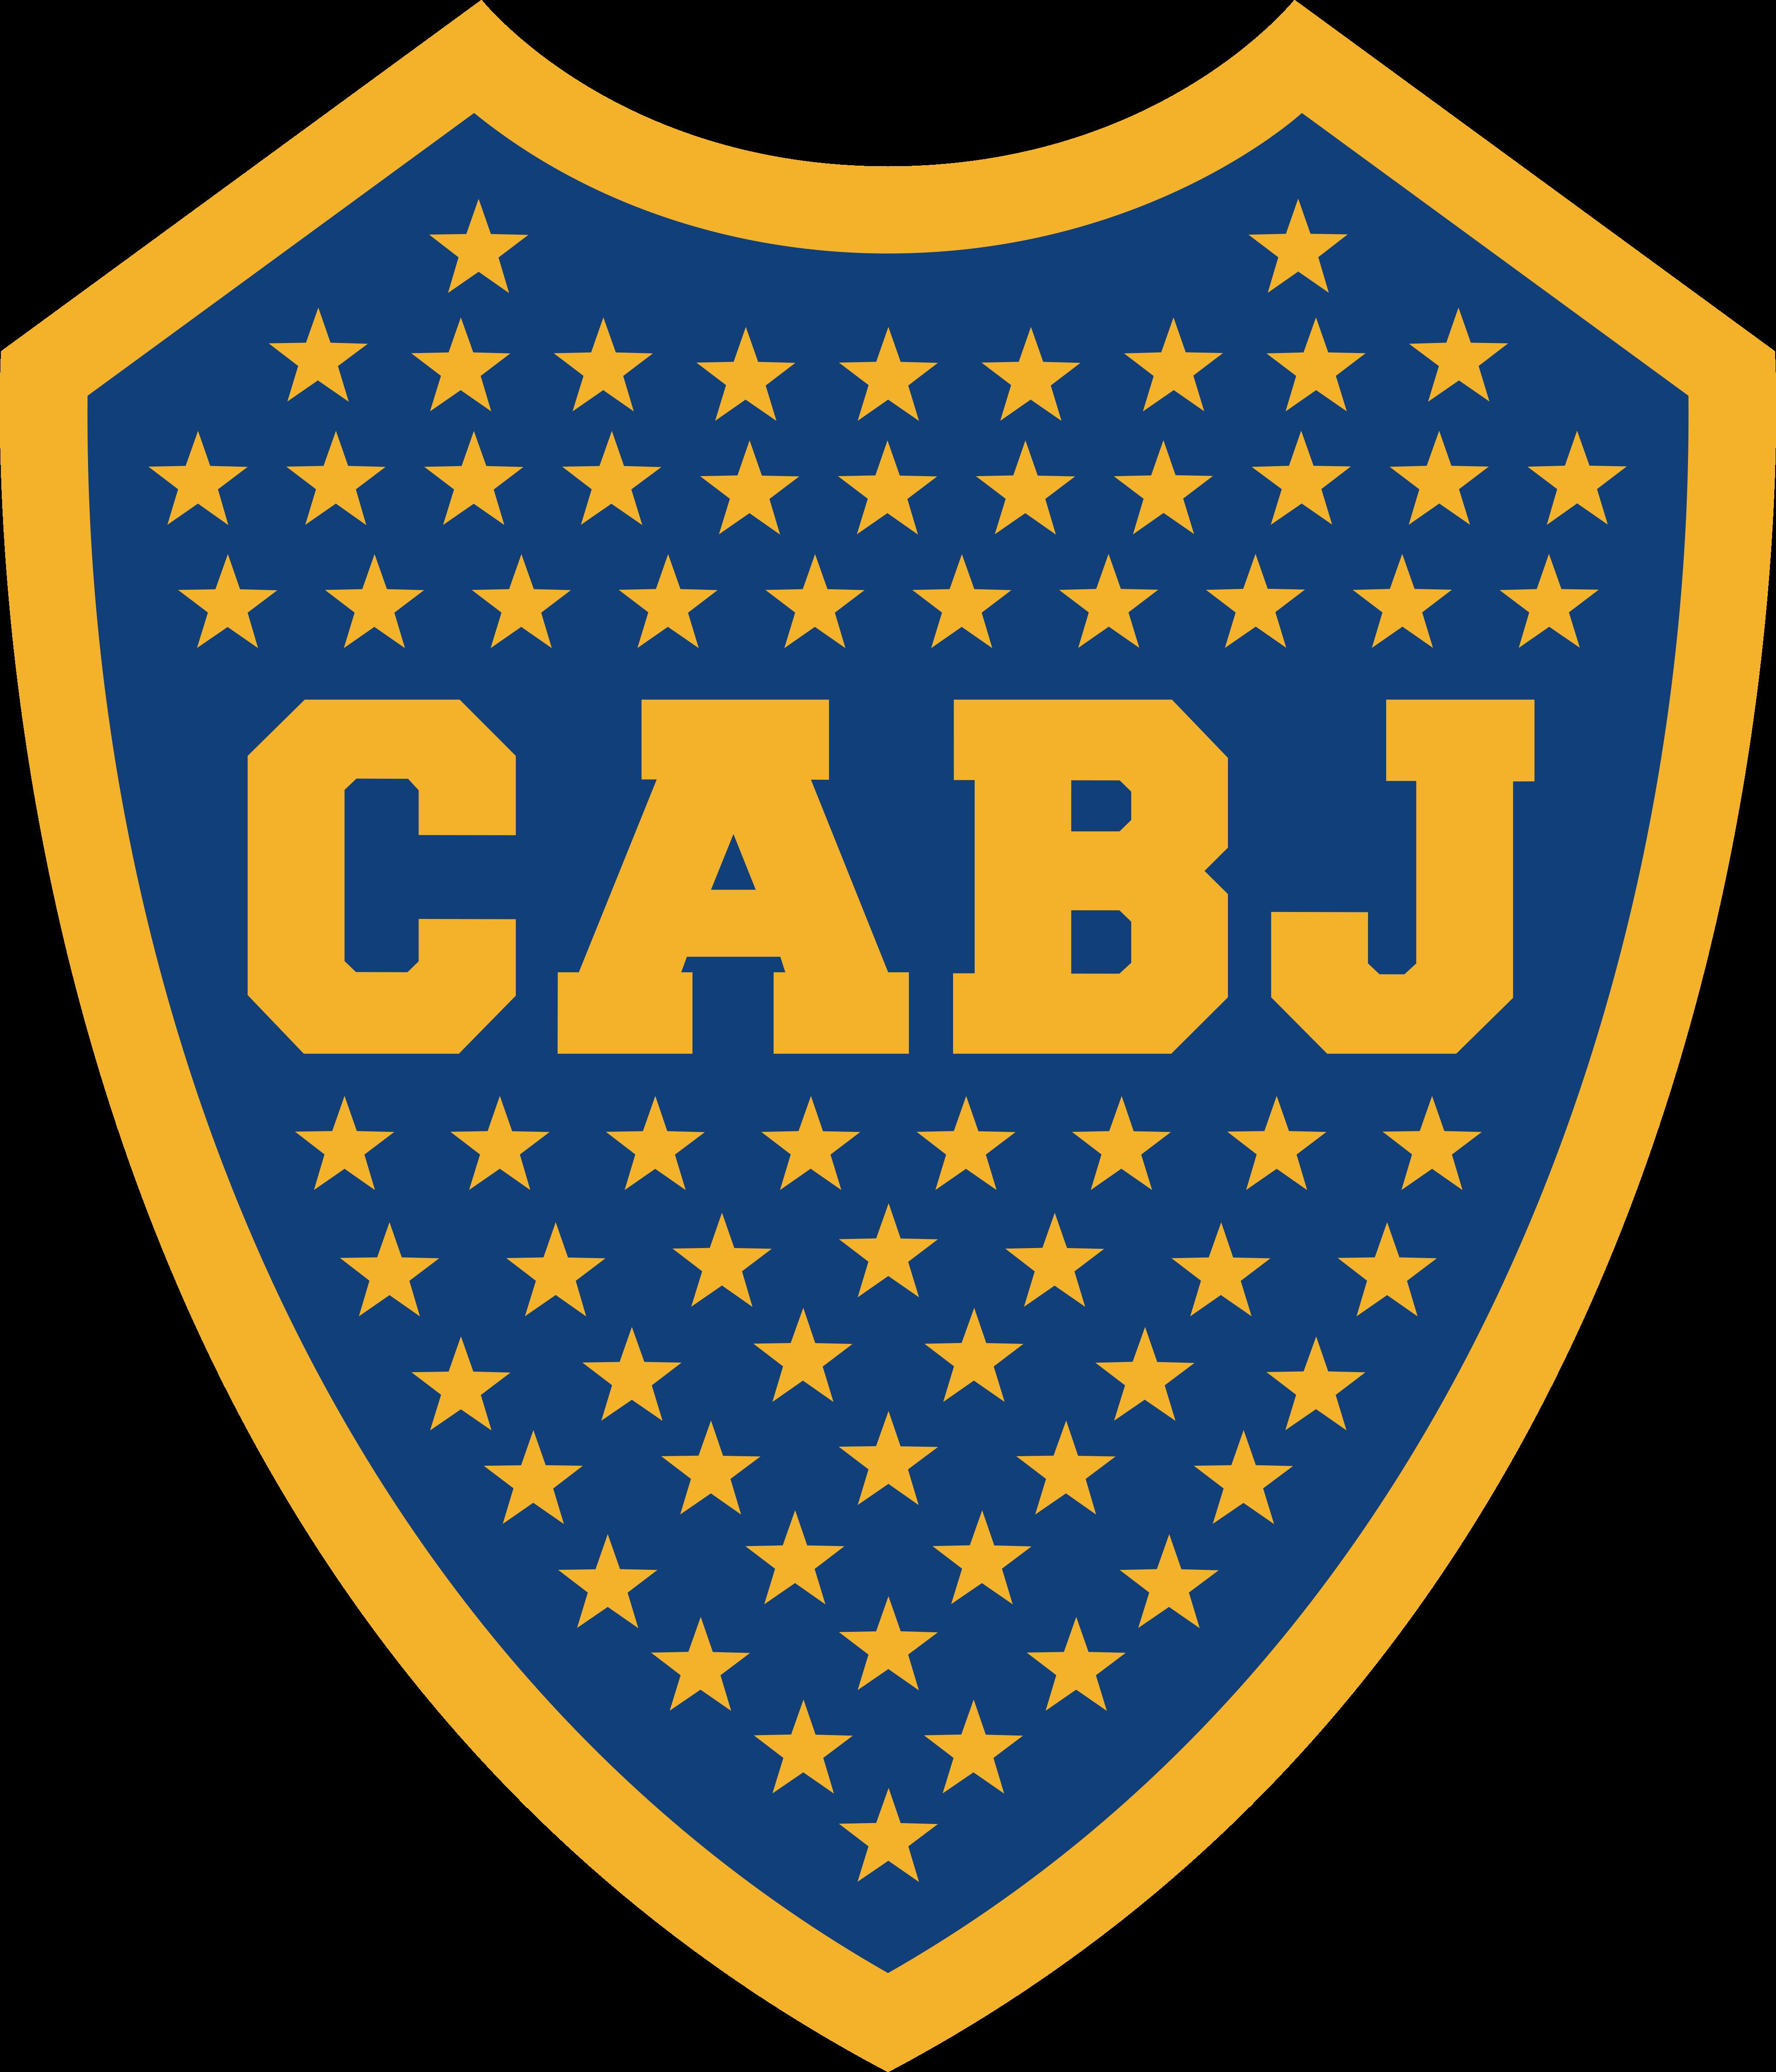 boca juniors logo escudo 7 - Boca Juniors Logo - Escudo